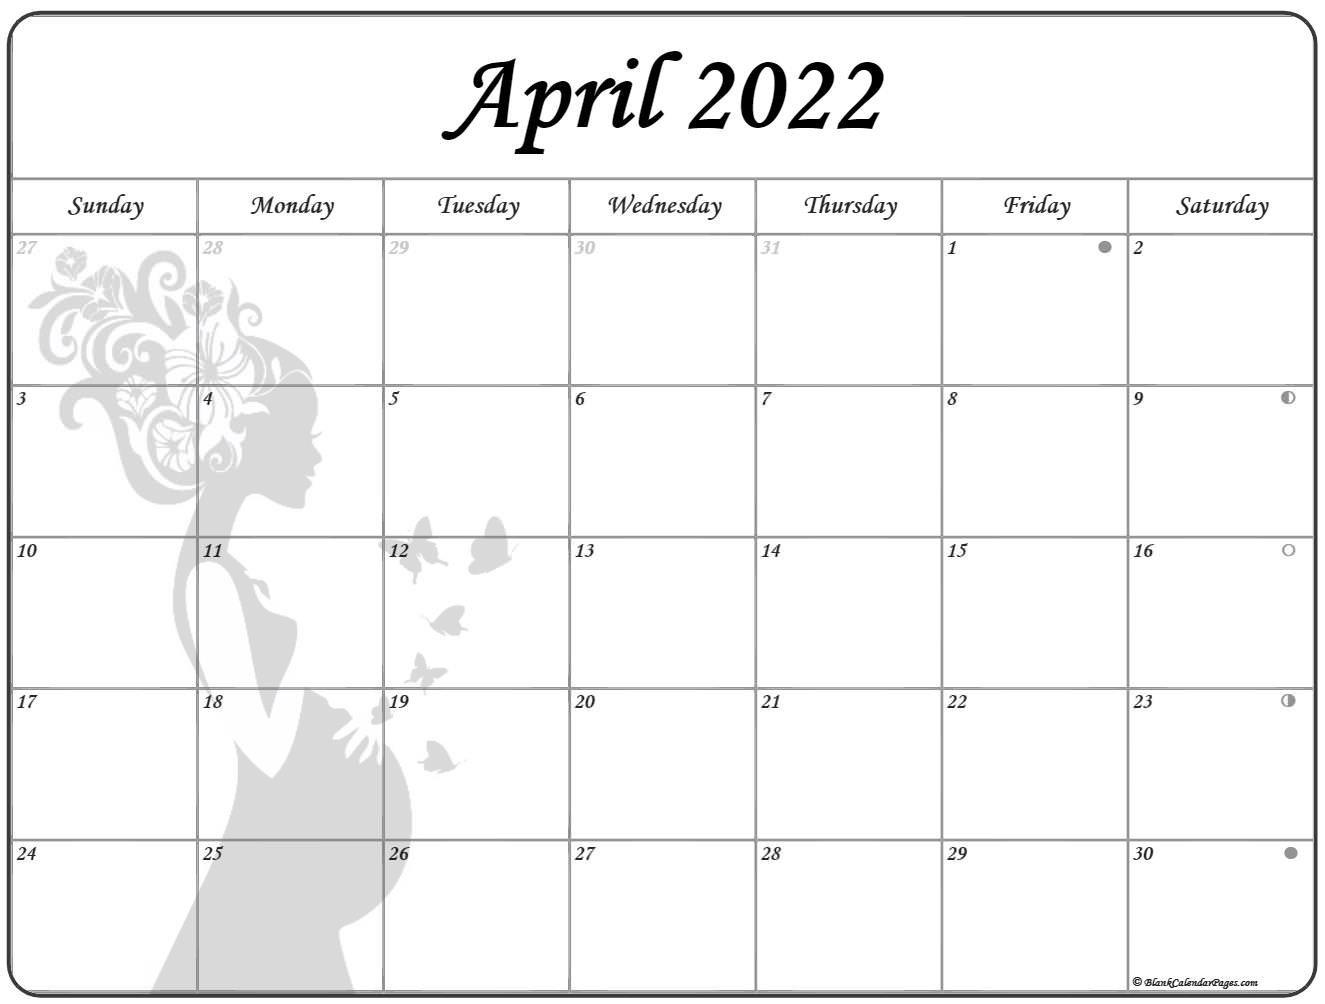 April 2022 Pregnancy Calendar | Fertility Calendar throughout 2022 April Calendar Free Printable